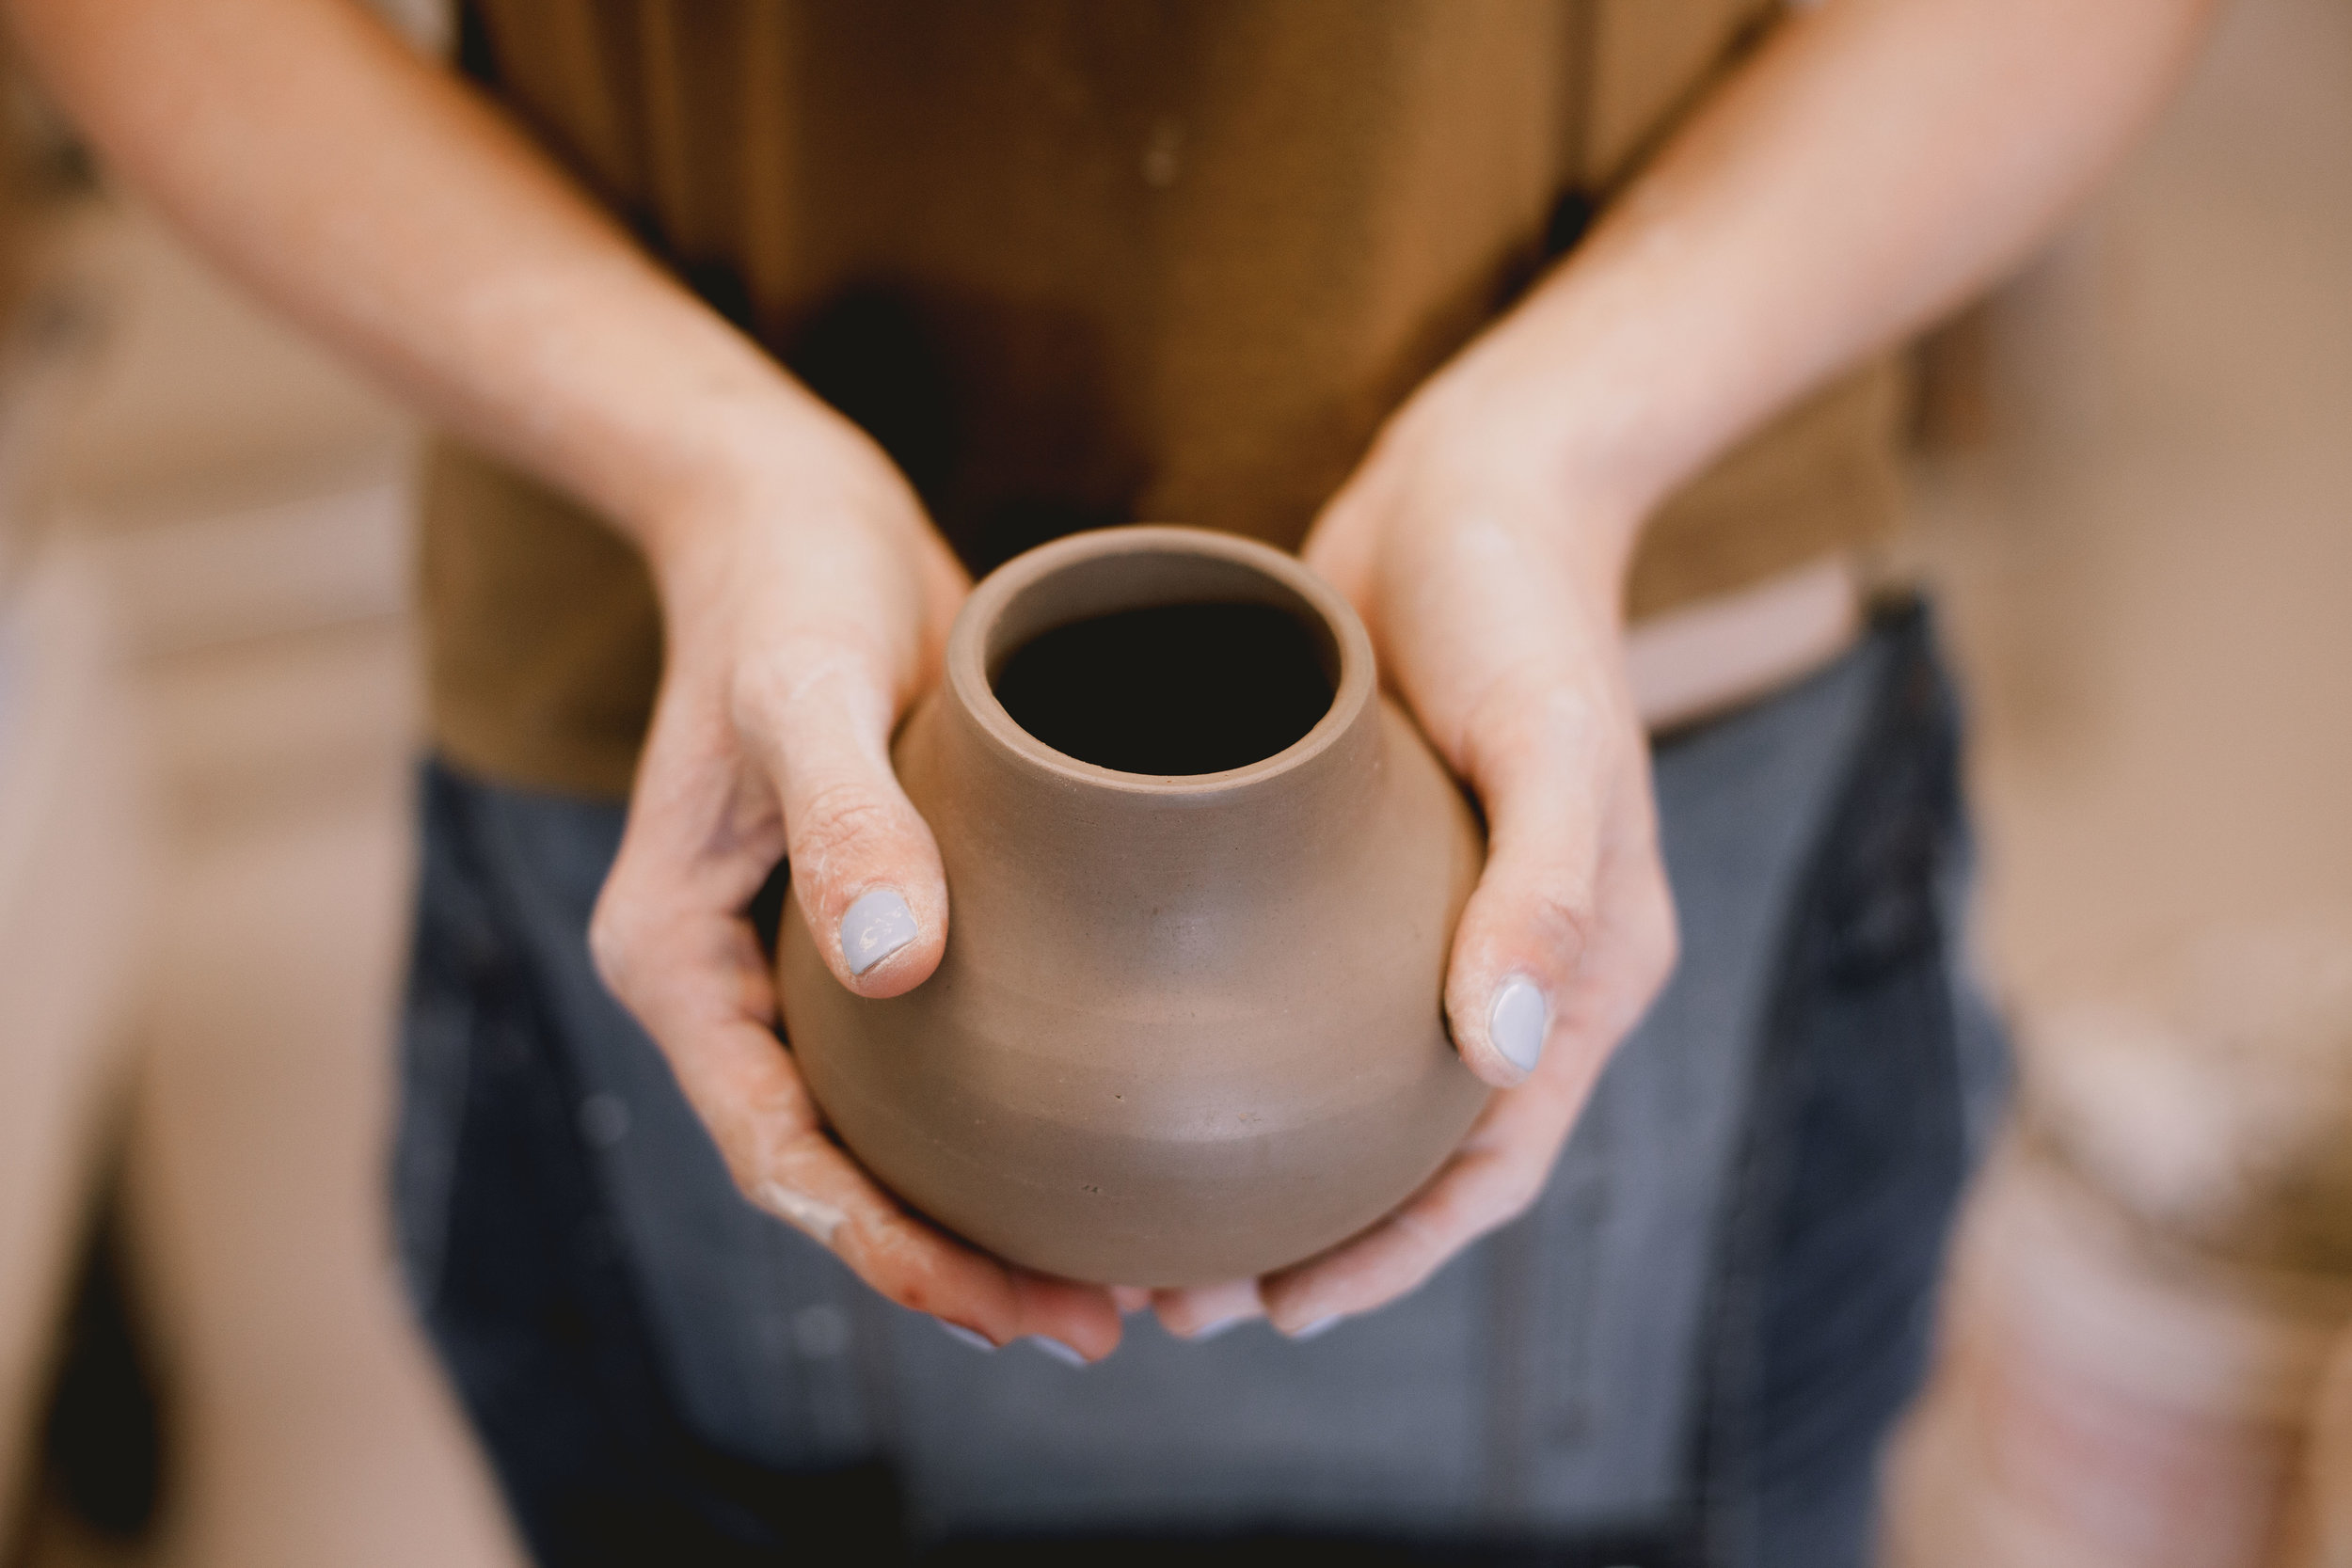 create-with-gusto-branding-san-diego-photography-handmade-artisan-isiko-041.jpg